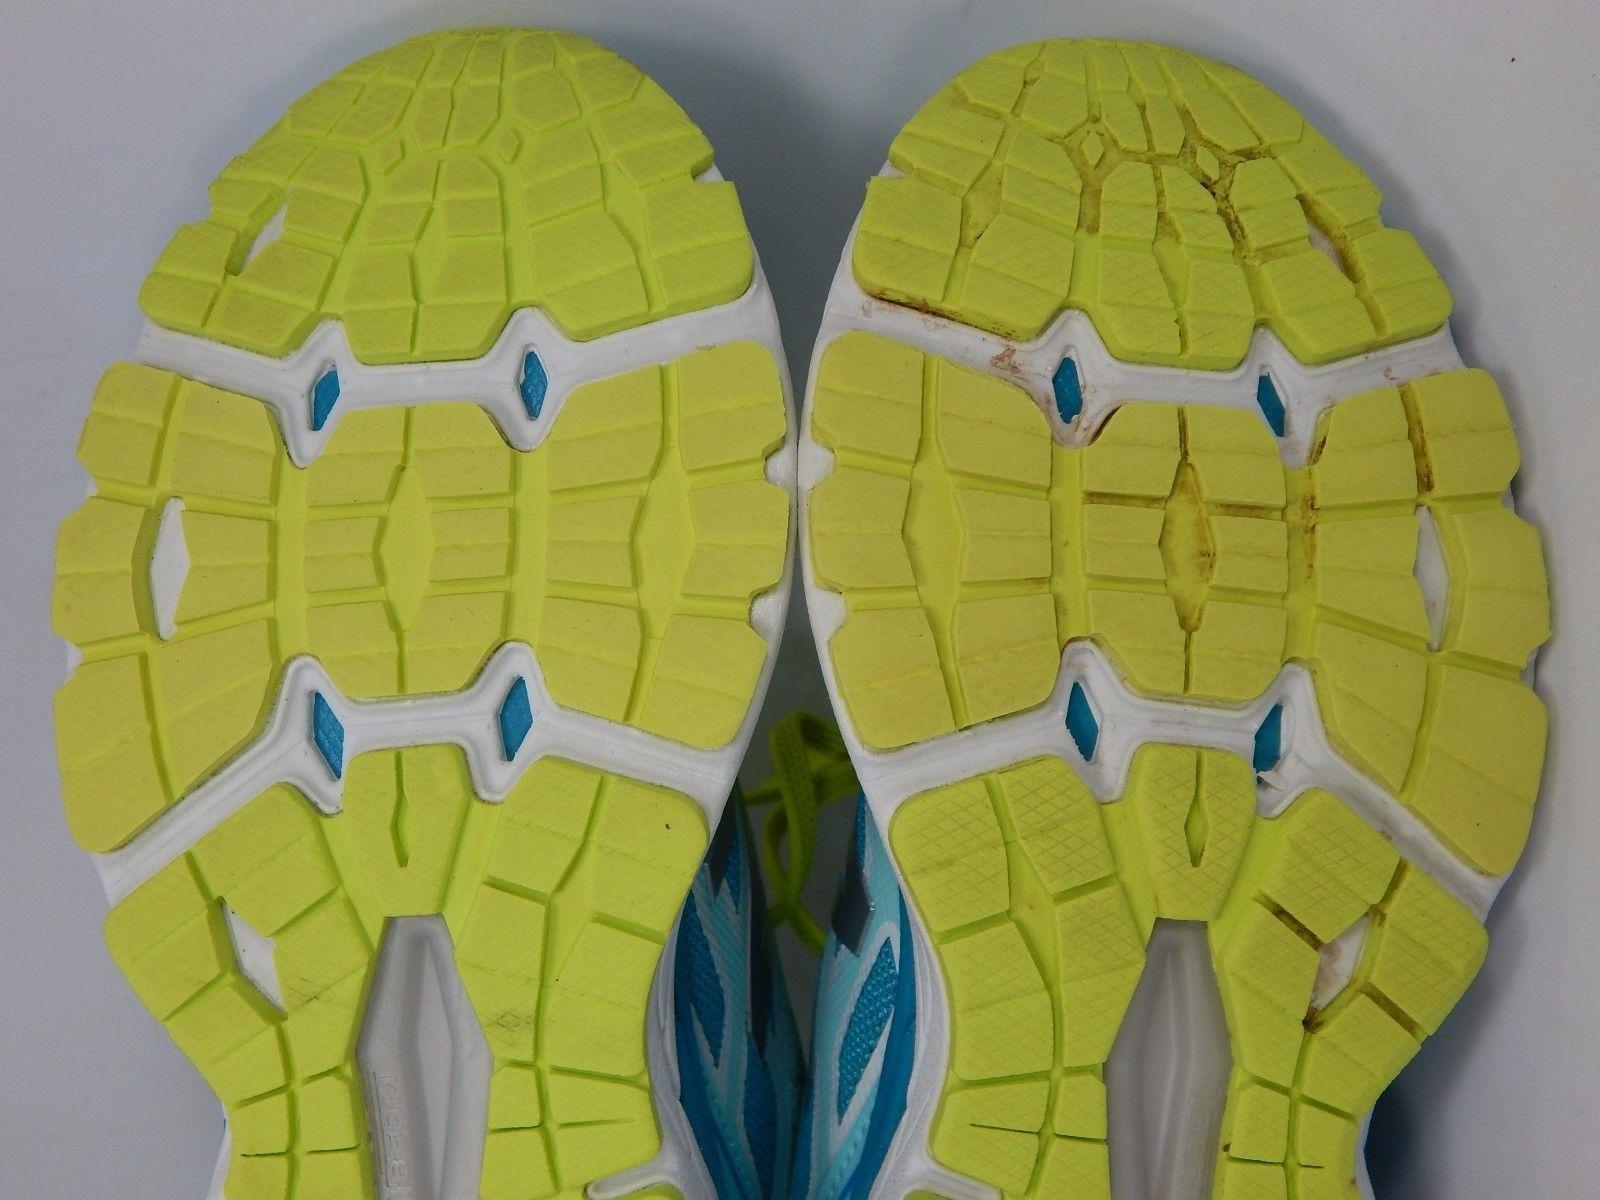 MISMATCH New Balance 880 v5 Women's Running Shoes 8 M (B) Left & 7.5 Right M (B)